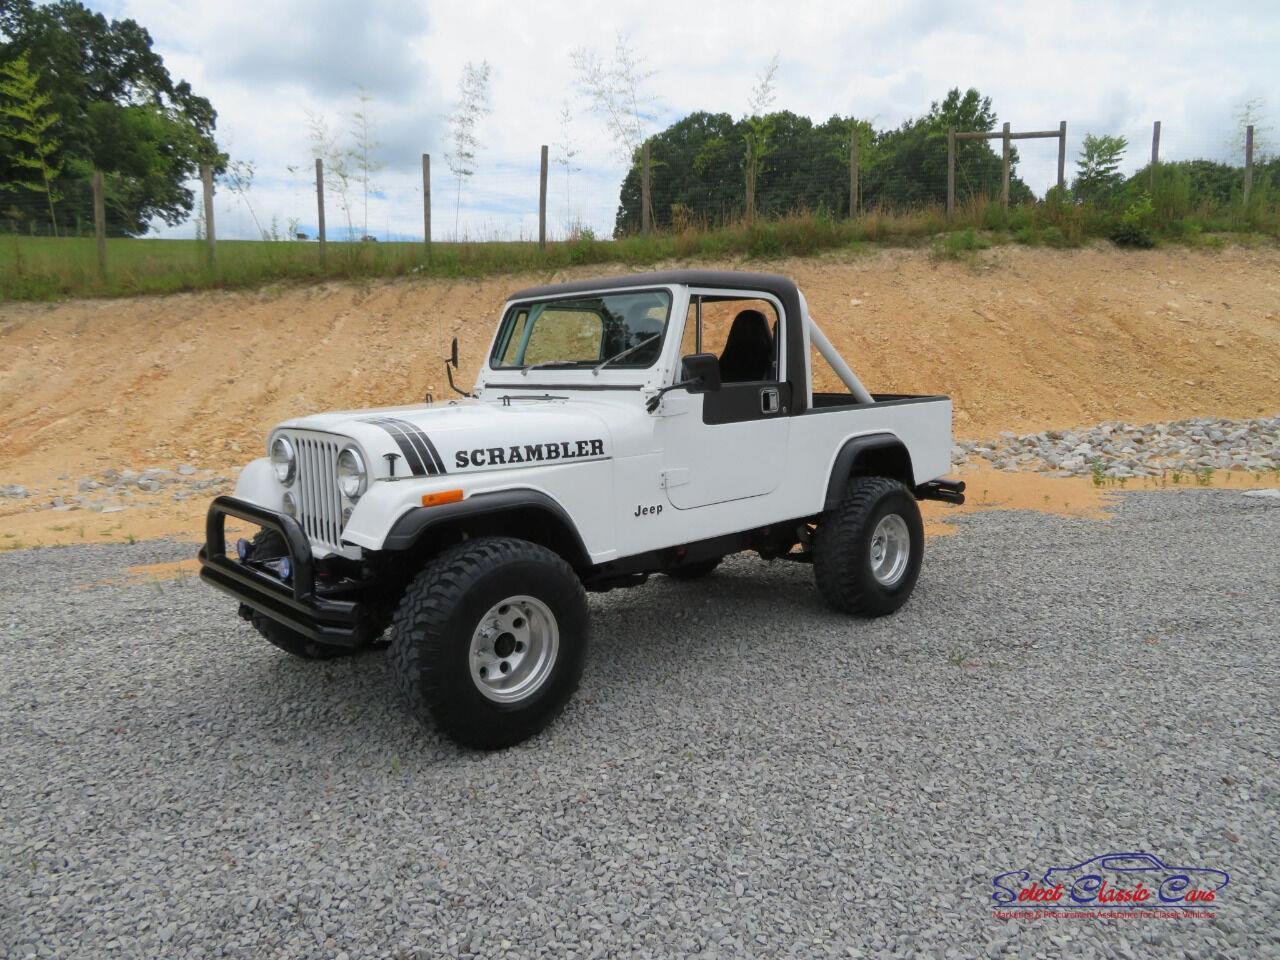 for sale 1982 jeep cj8 scrambler in hiram, georgia cars - hiram, ga at geebo